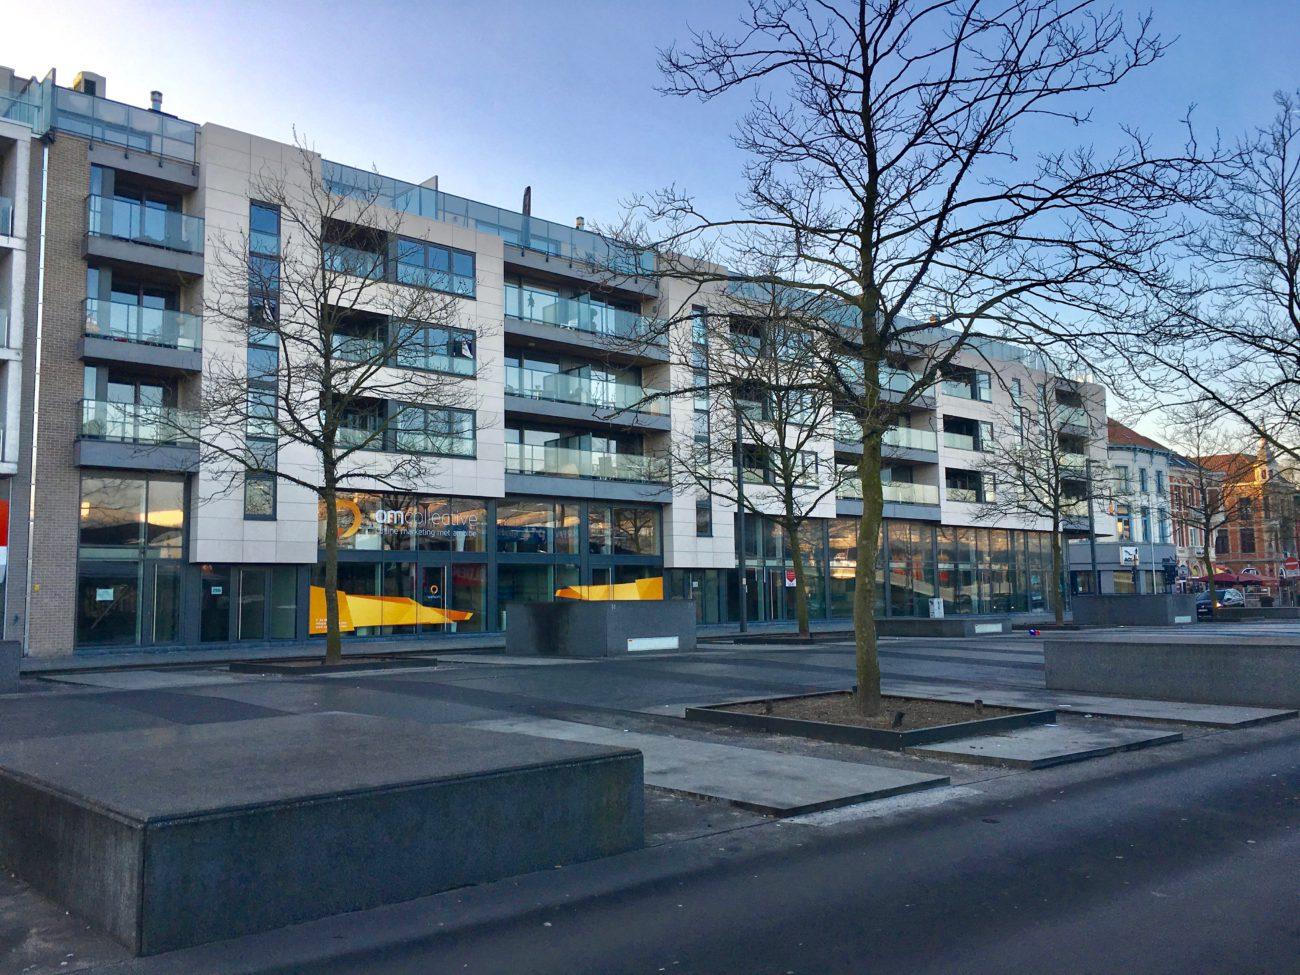 Plaza Express Sint-Niklaas Stationsplein Appartementen Zijgevel